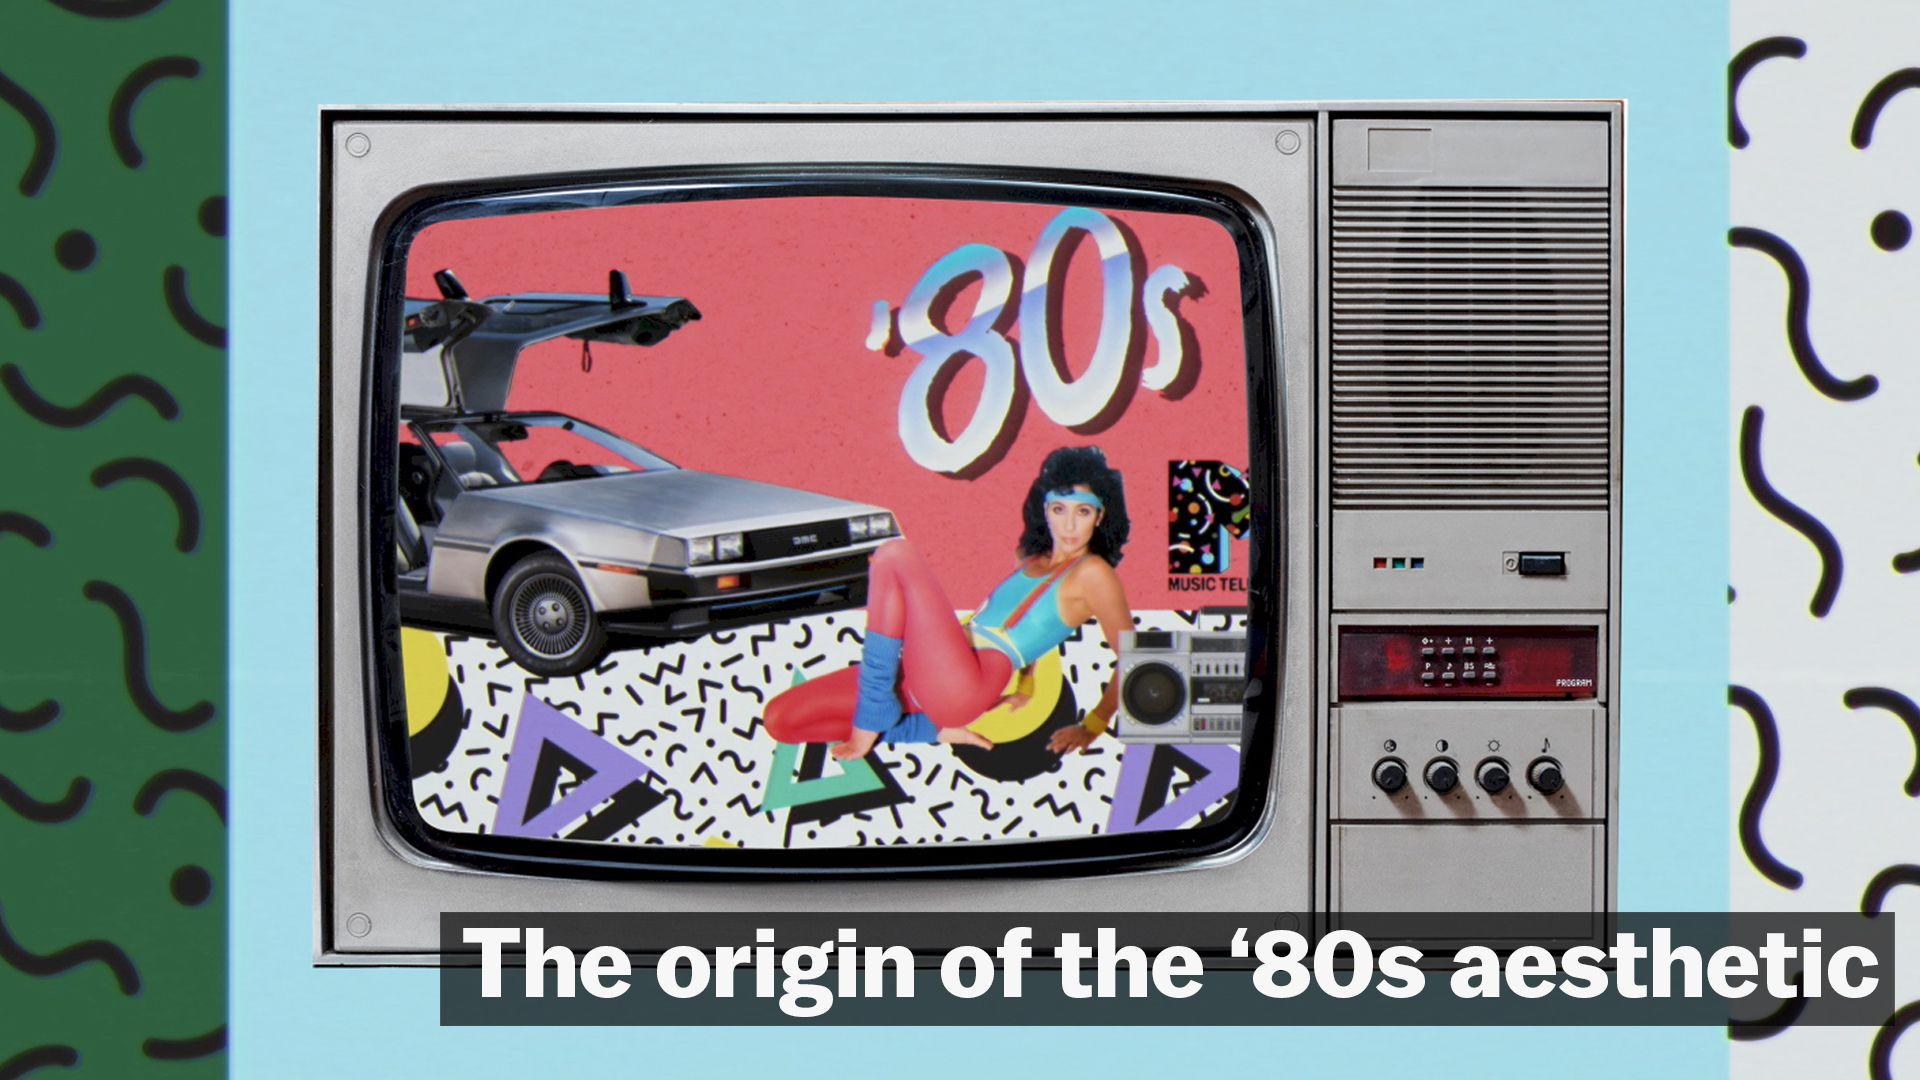 The origin of the '80s aesthetic - Vox